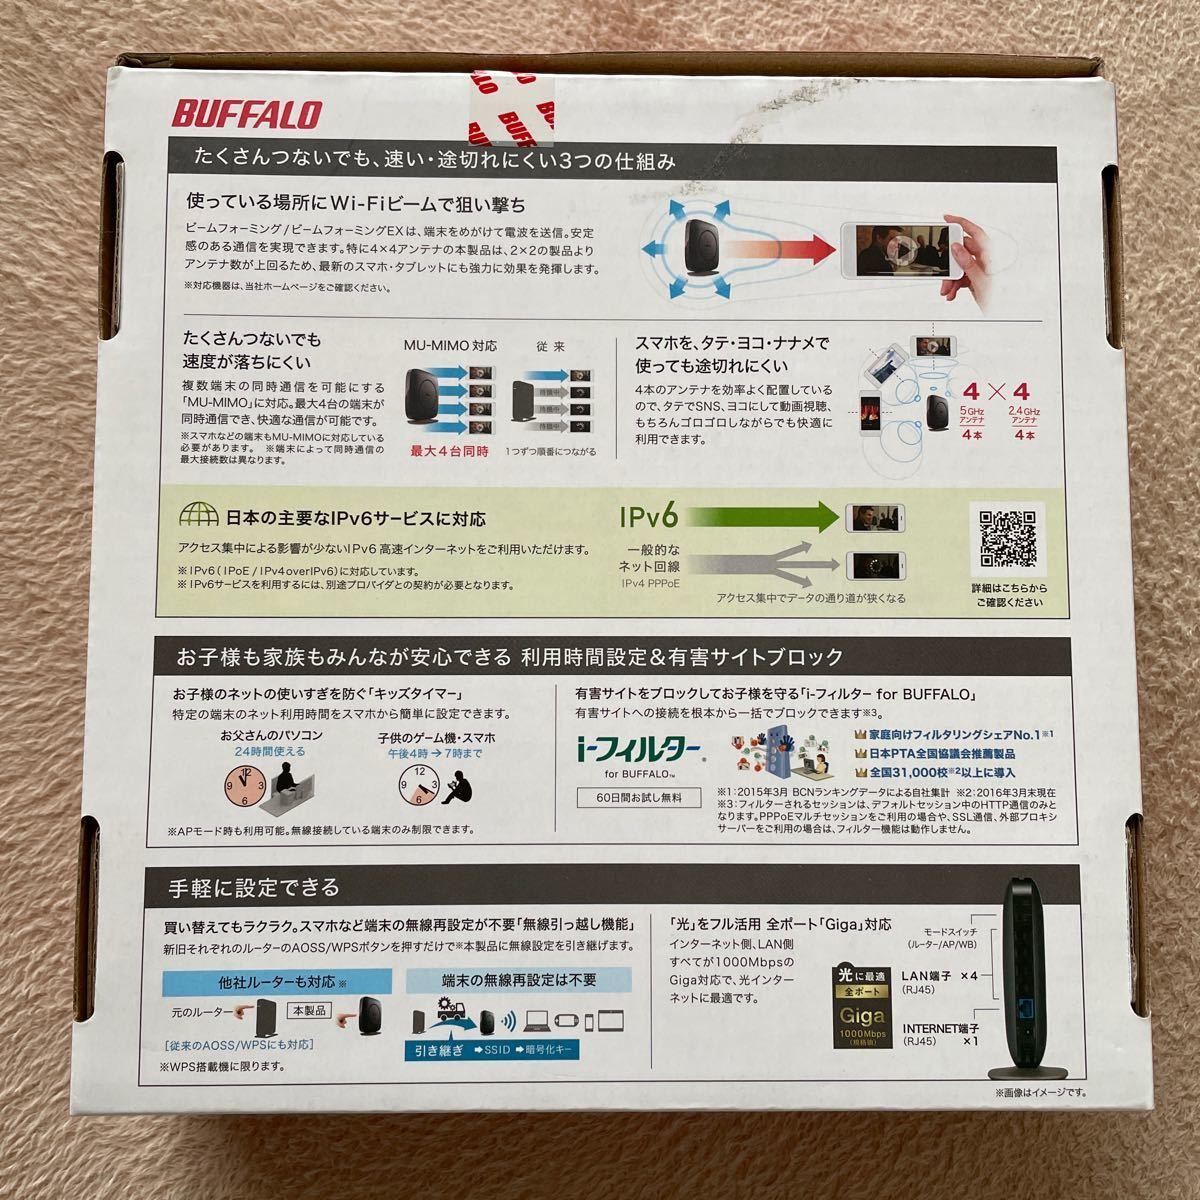 BUFFALO 無線LAN親機 Wi-Fiルーター